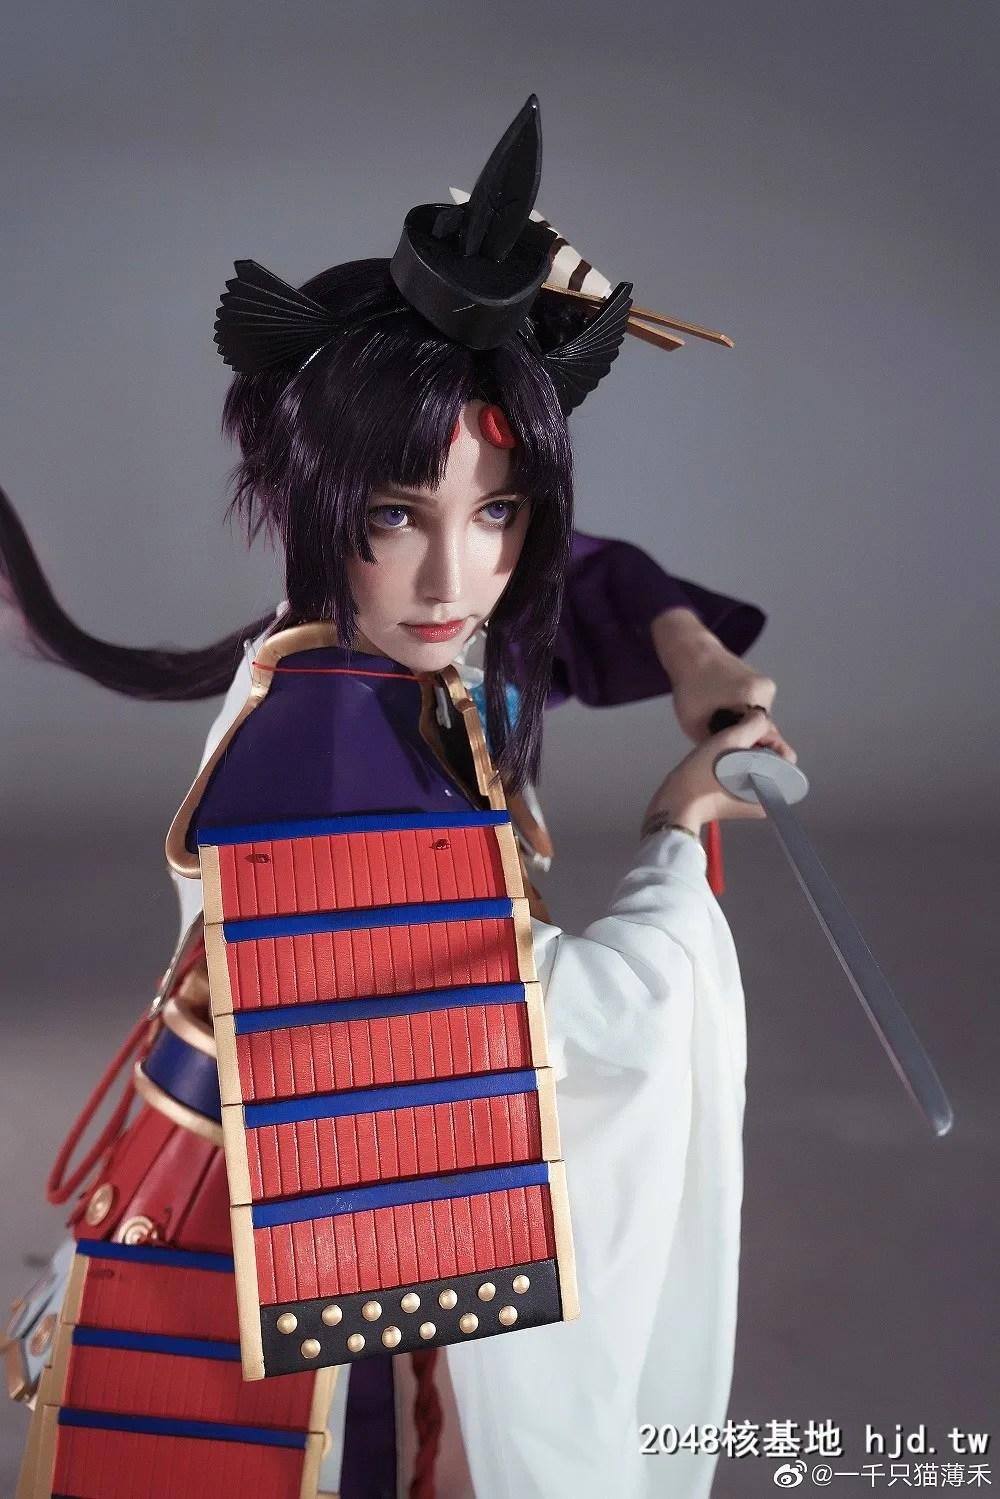 Fate/GrandOrder牛若丸 绝对魔兽战线@一千只猫薄禾 (9P)插图(6)